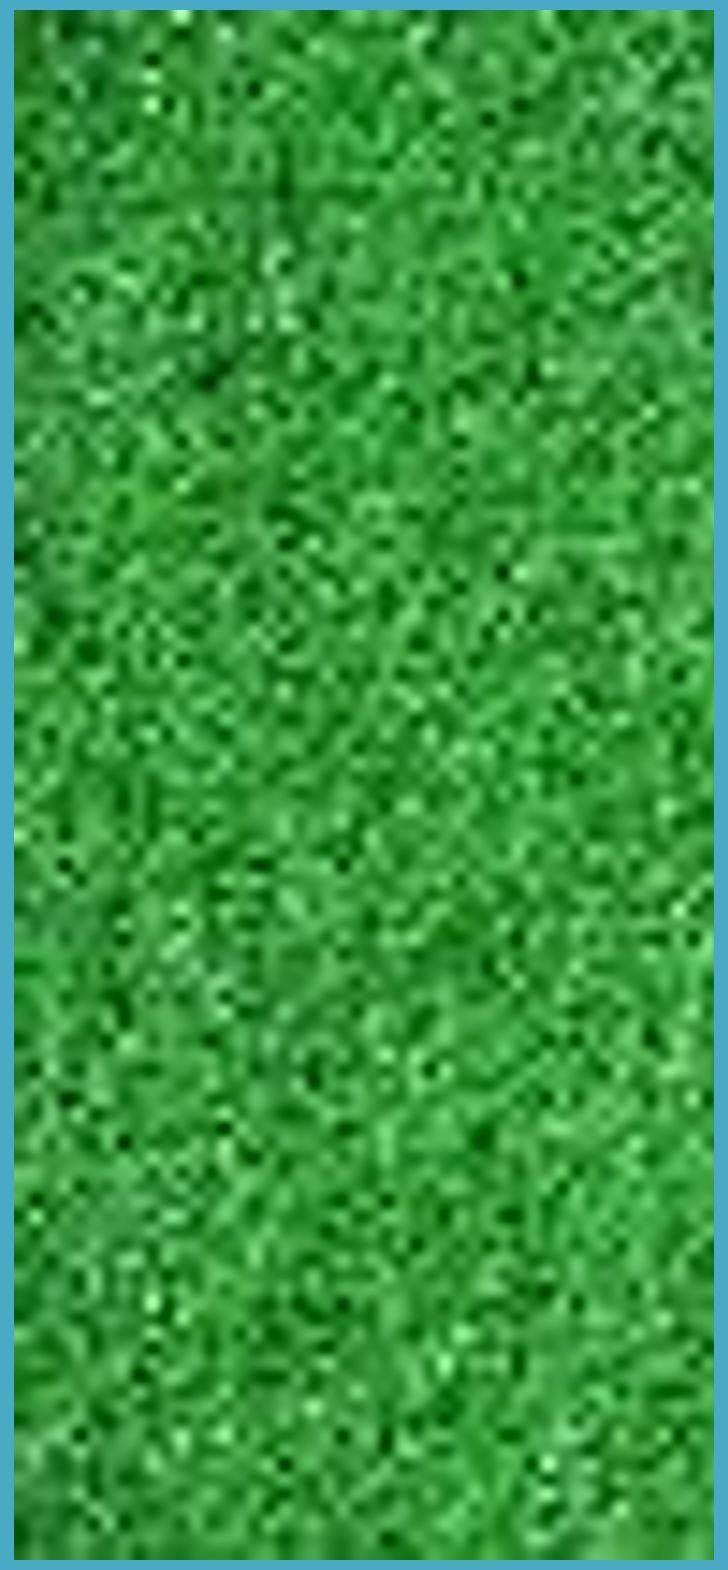 Dean Premium Heavy Duty Indoor Outdoor Green Artificial Grass Turf Carpet Rug Putting Green D In 2020 Home Putting Green Backyard Putting Green Outdoor Putting Green